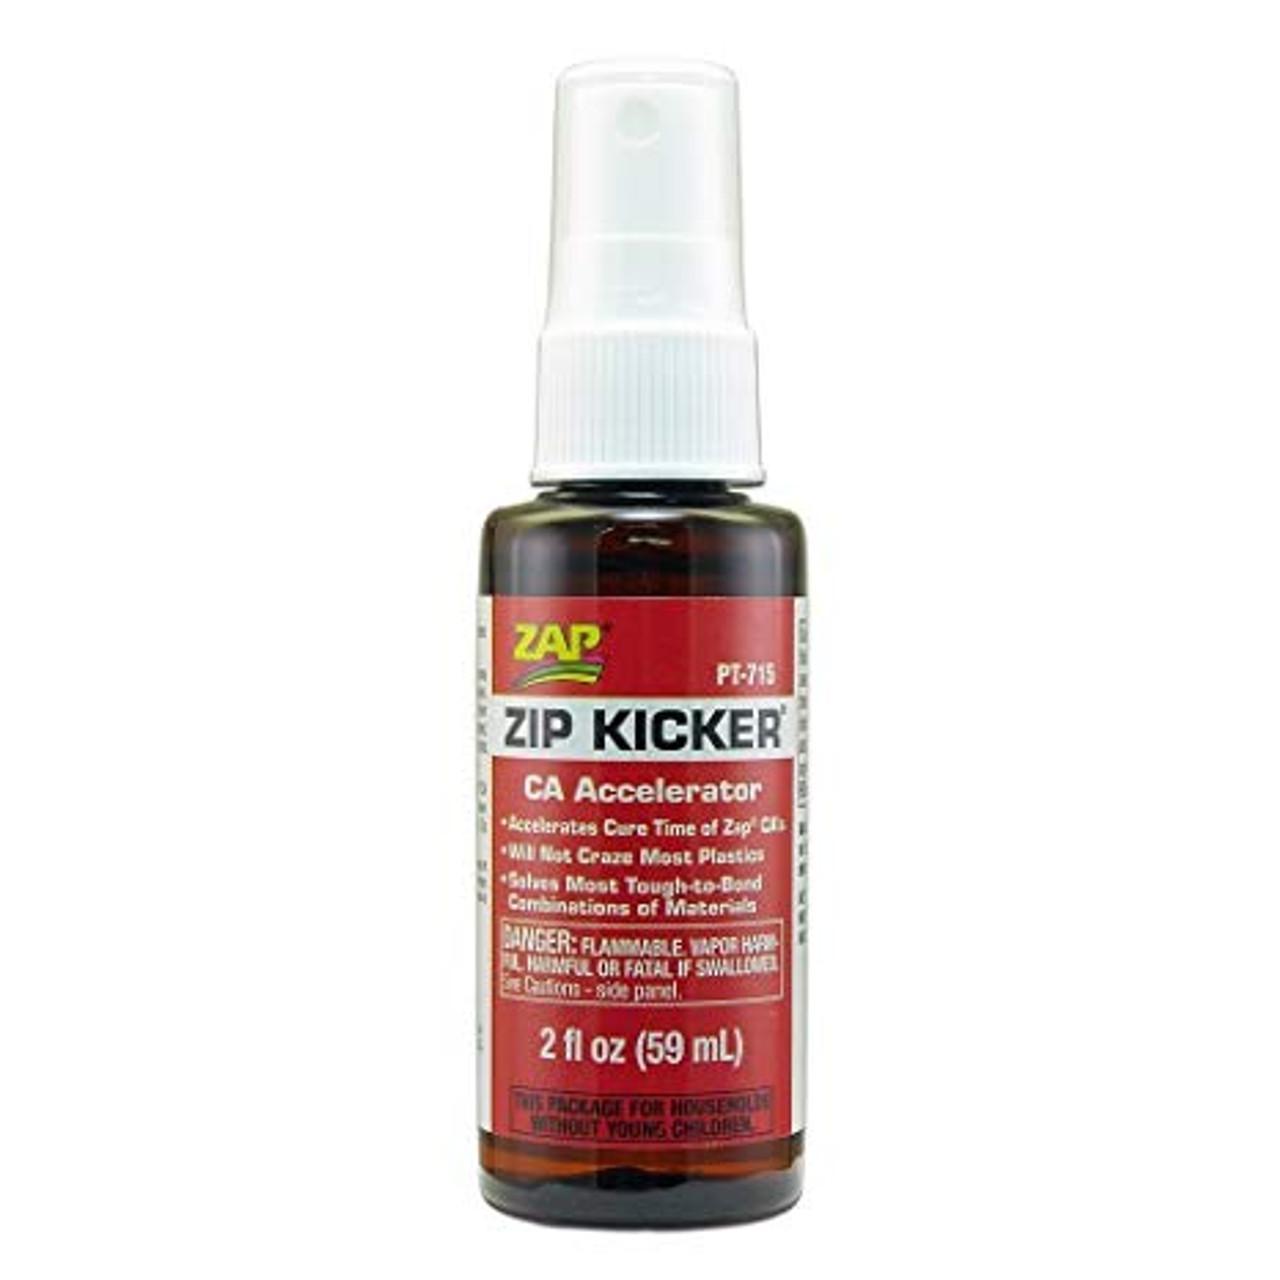 Zip Kicker Pump Spray